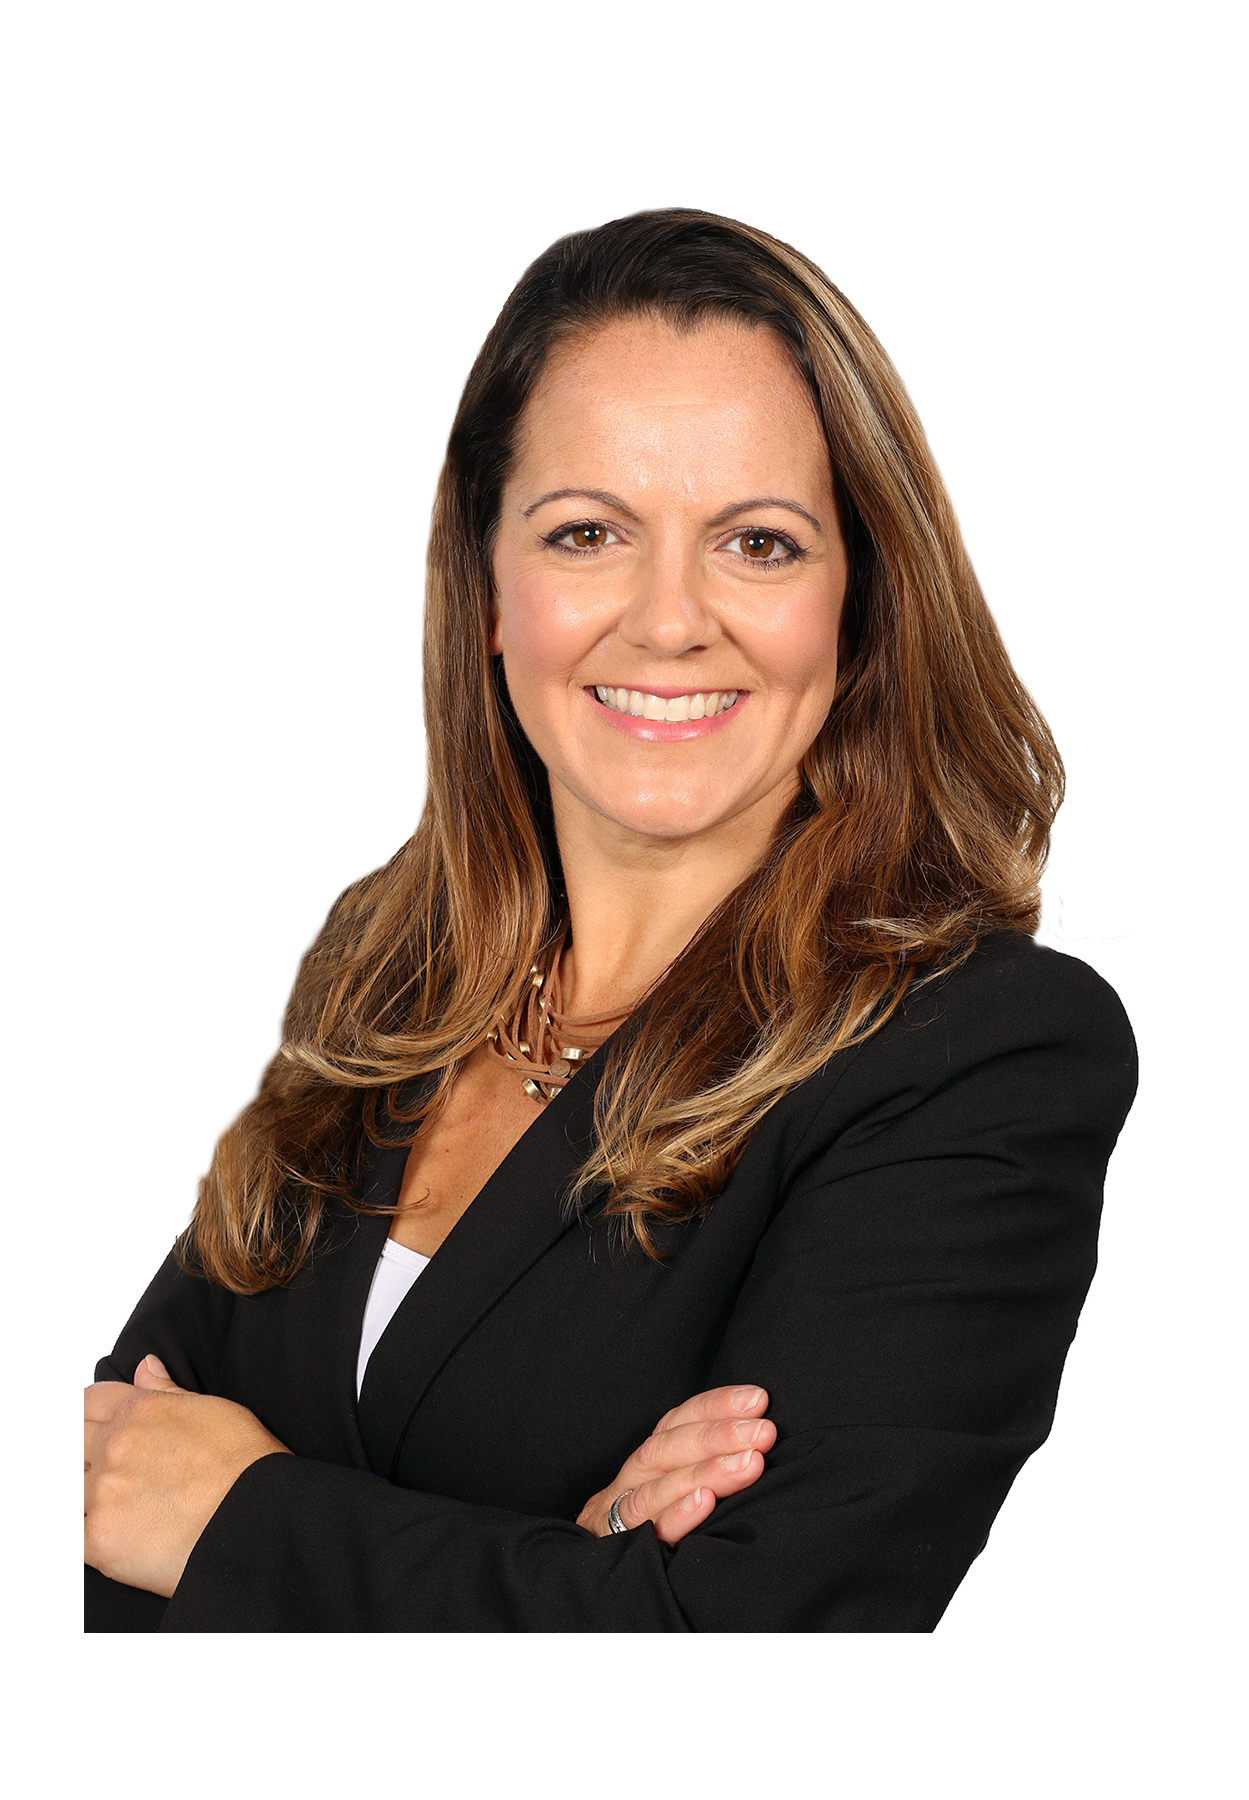 Gretchen Masciarelli